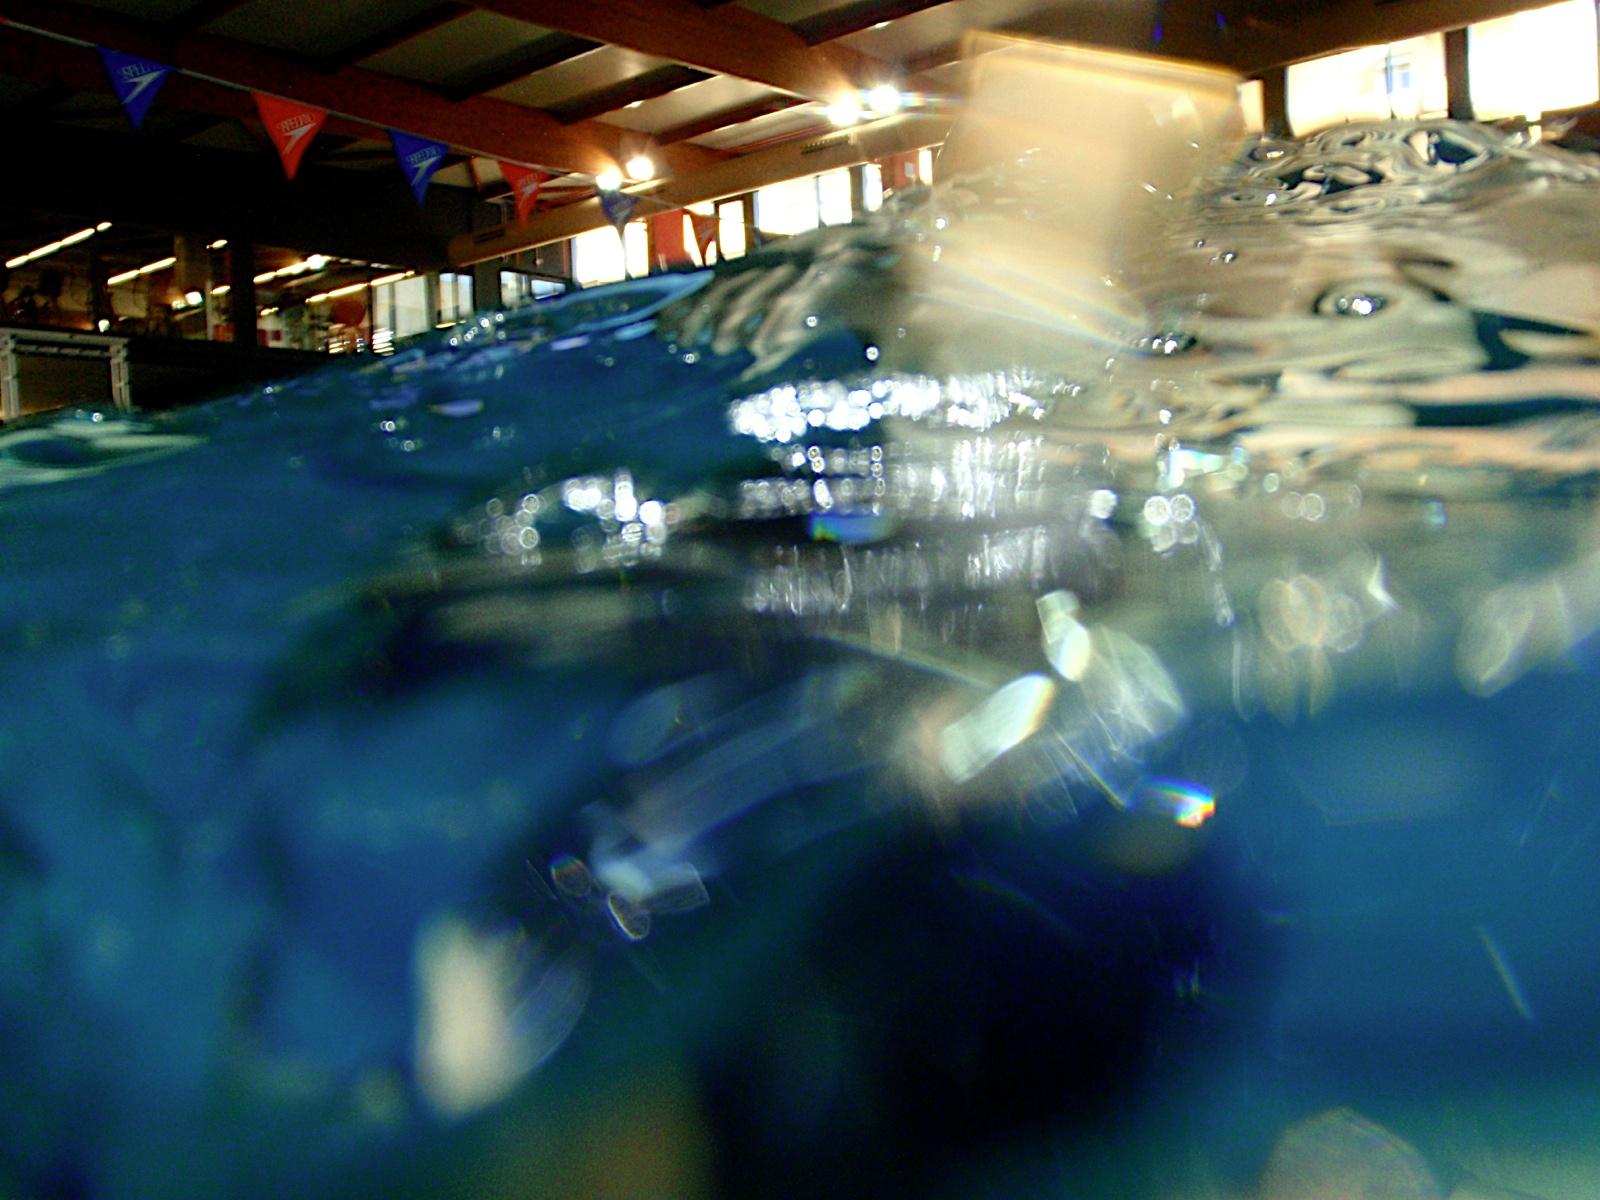 Monogràfic Marí 2010 - P5290252.JPG